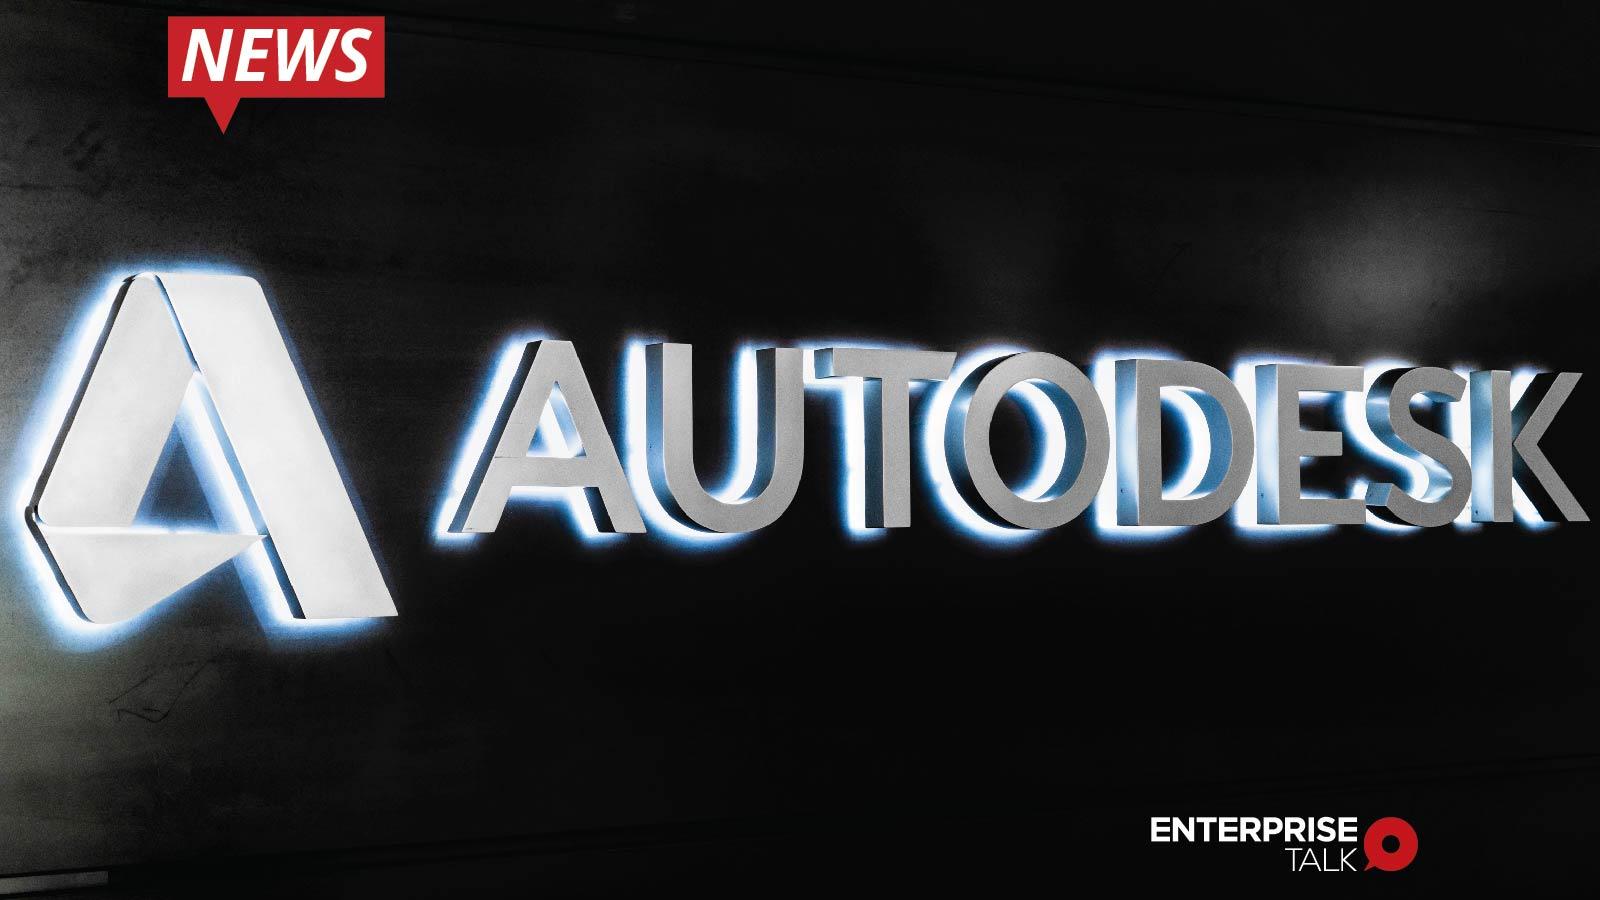 Autodesk Completes